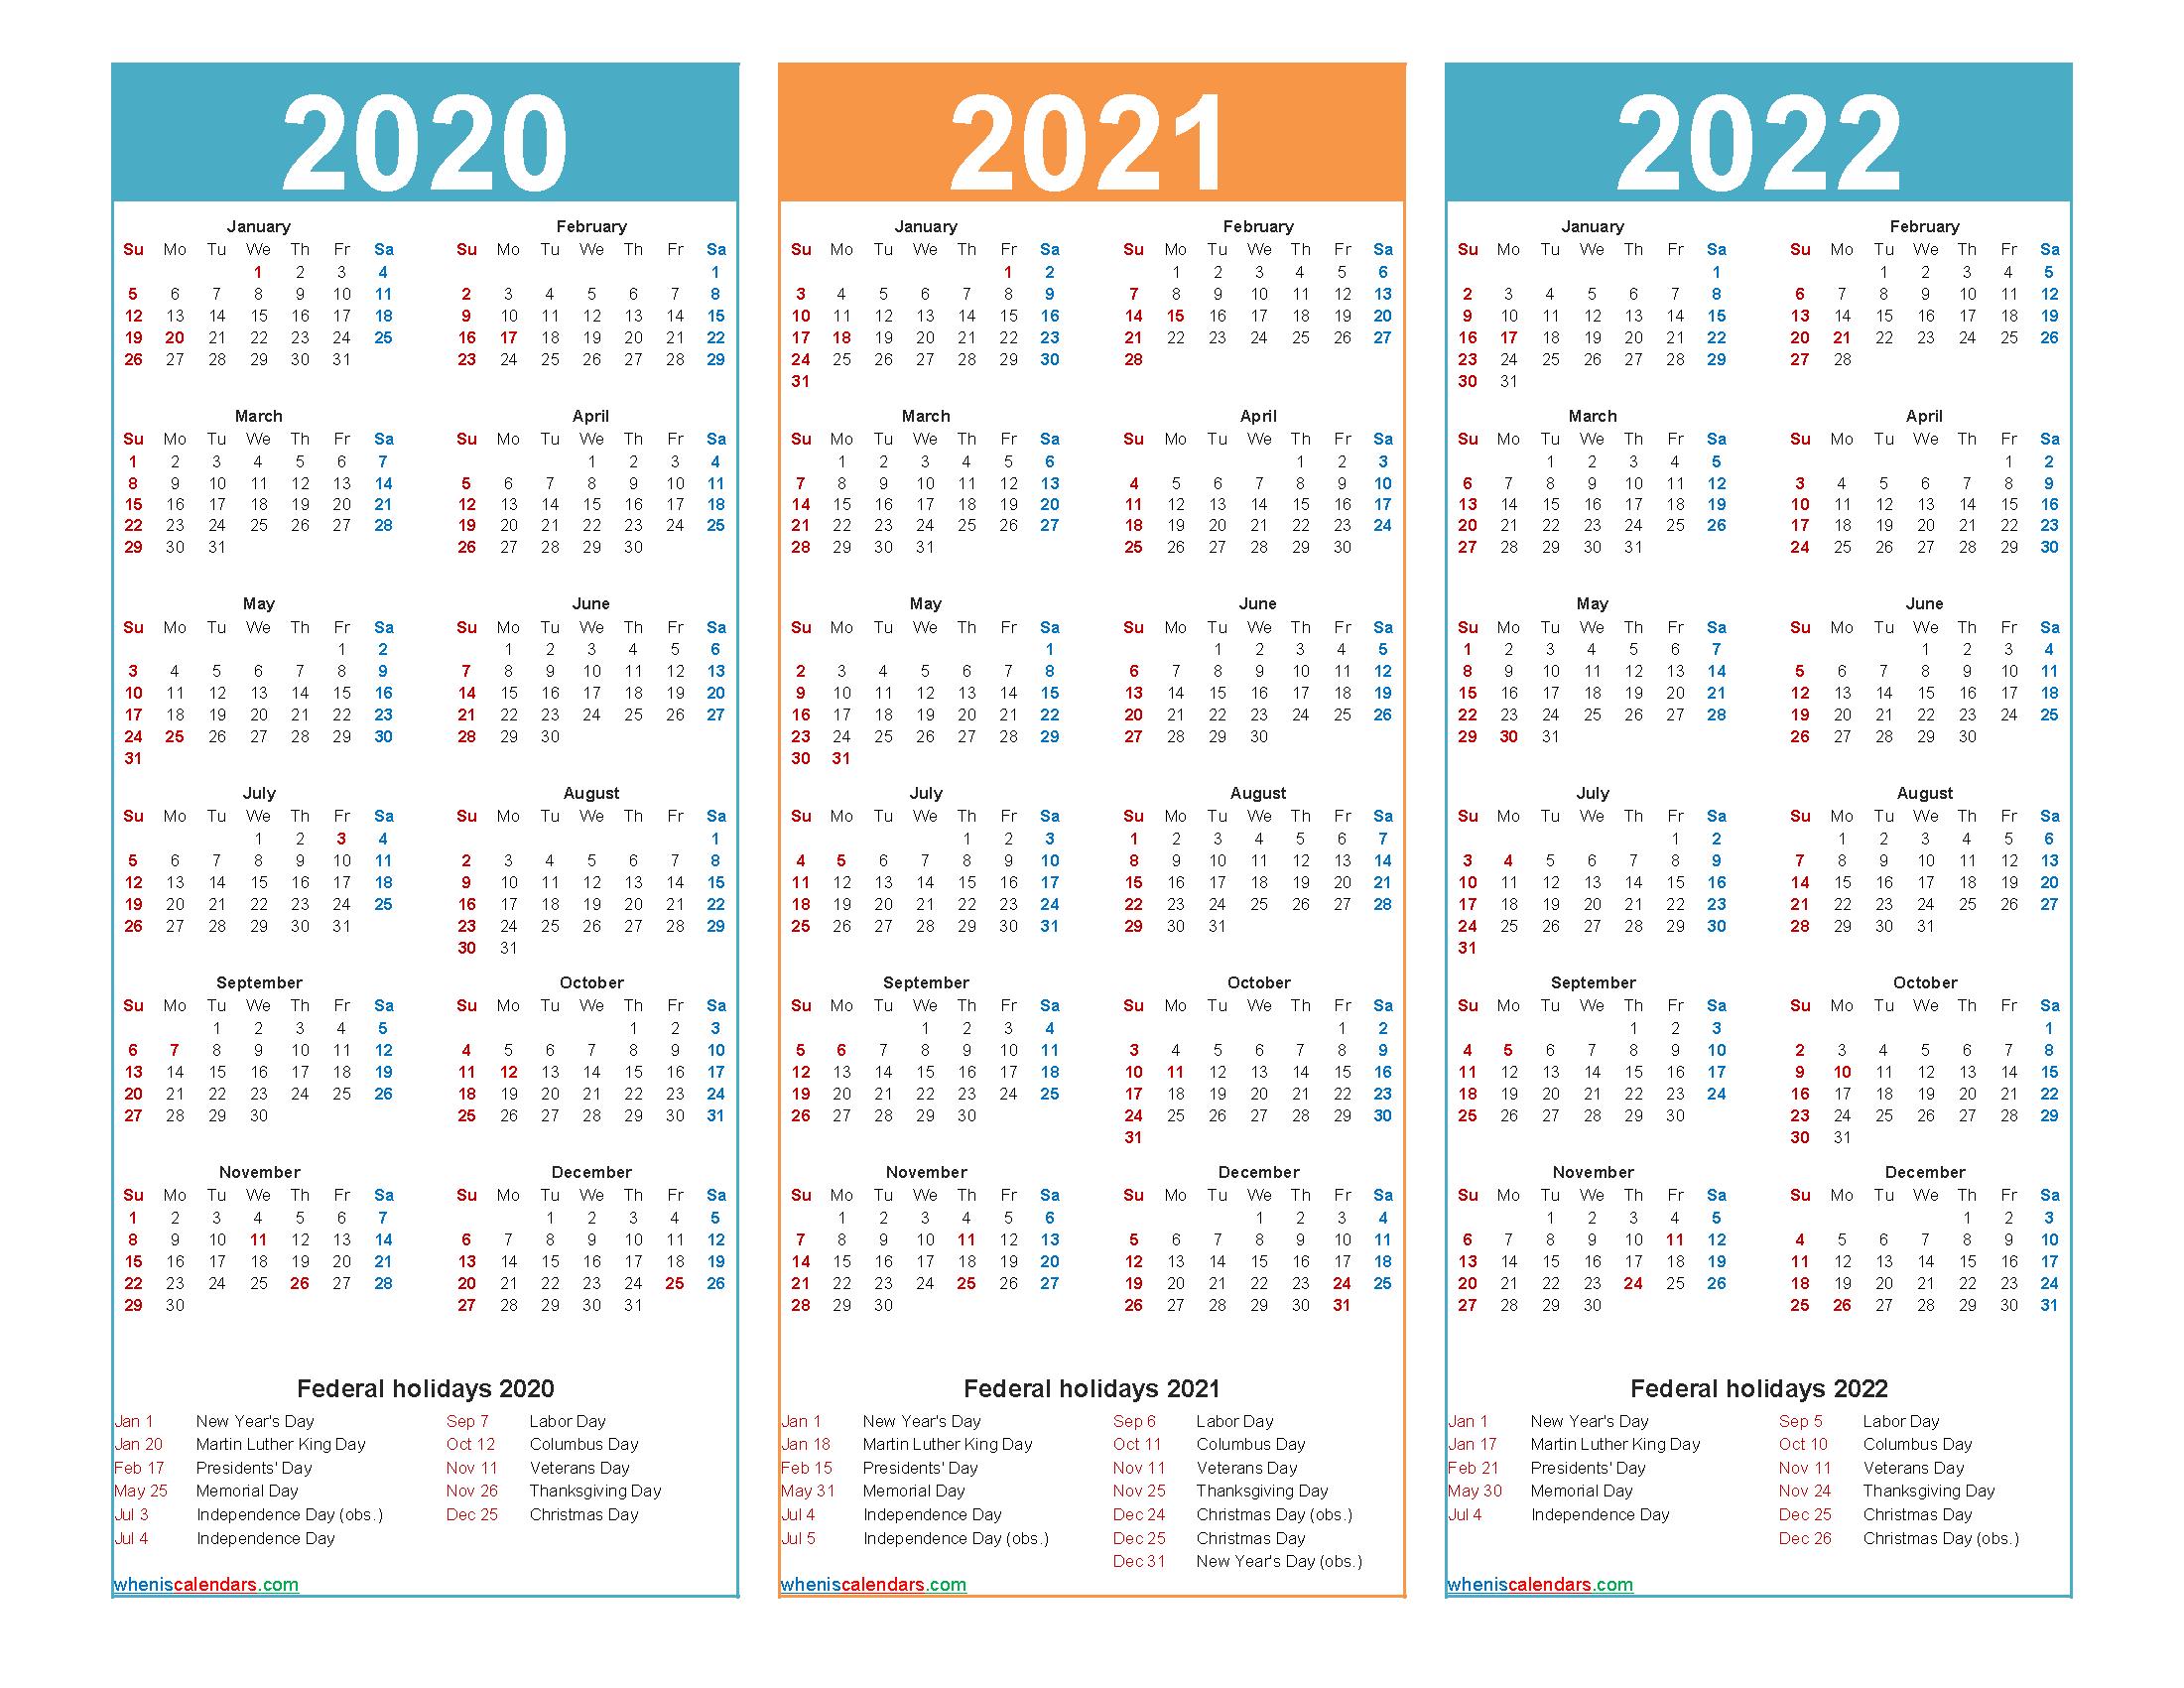 3 Year Calendar 2020 To 2022 Printable – Free Printable 2020 pertaining to 3 Year Calendar 2020